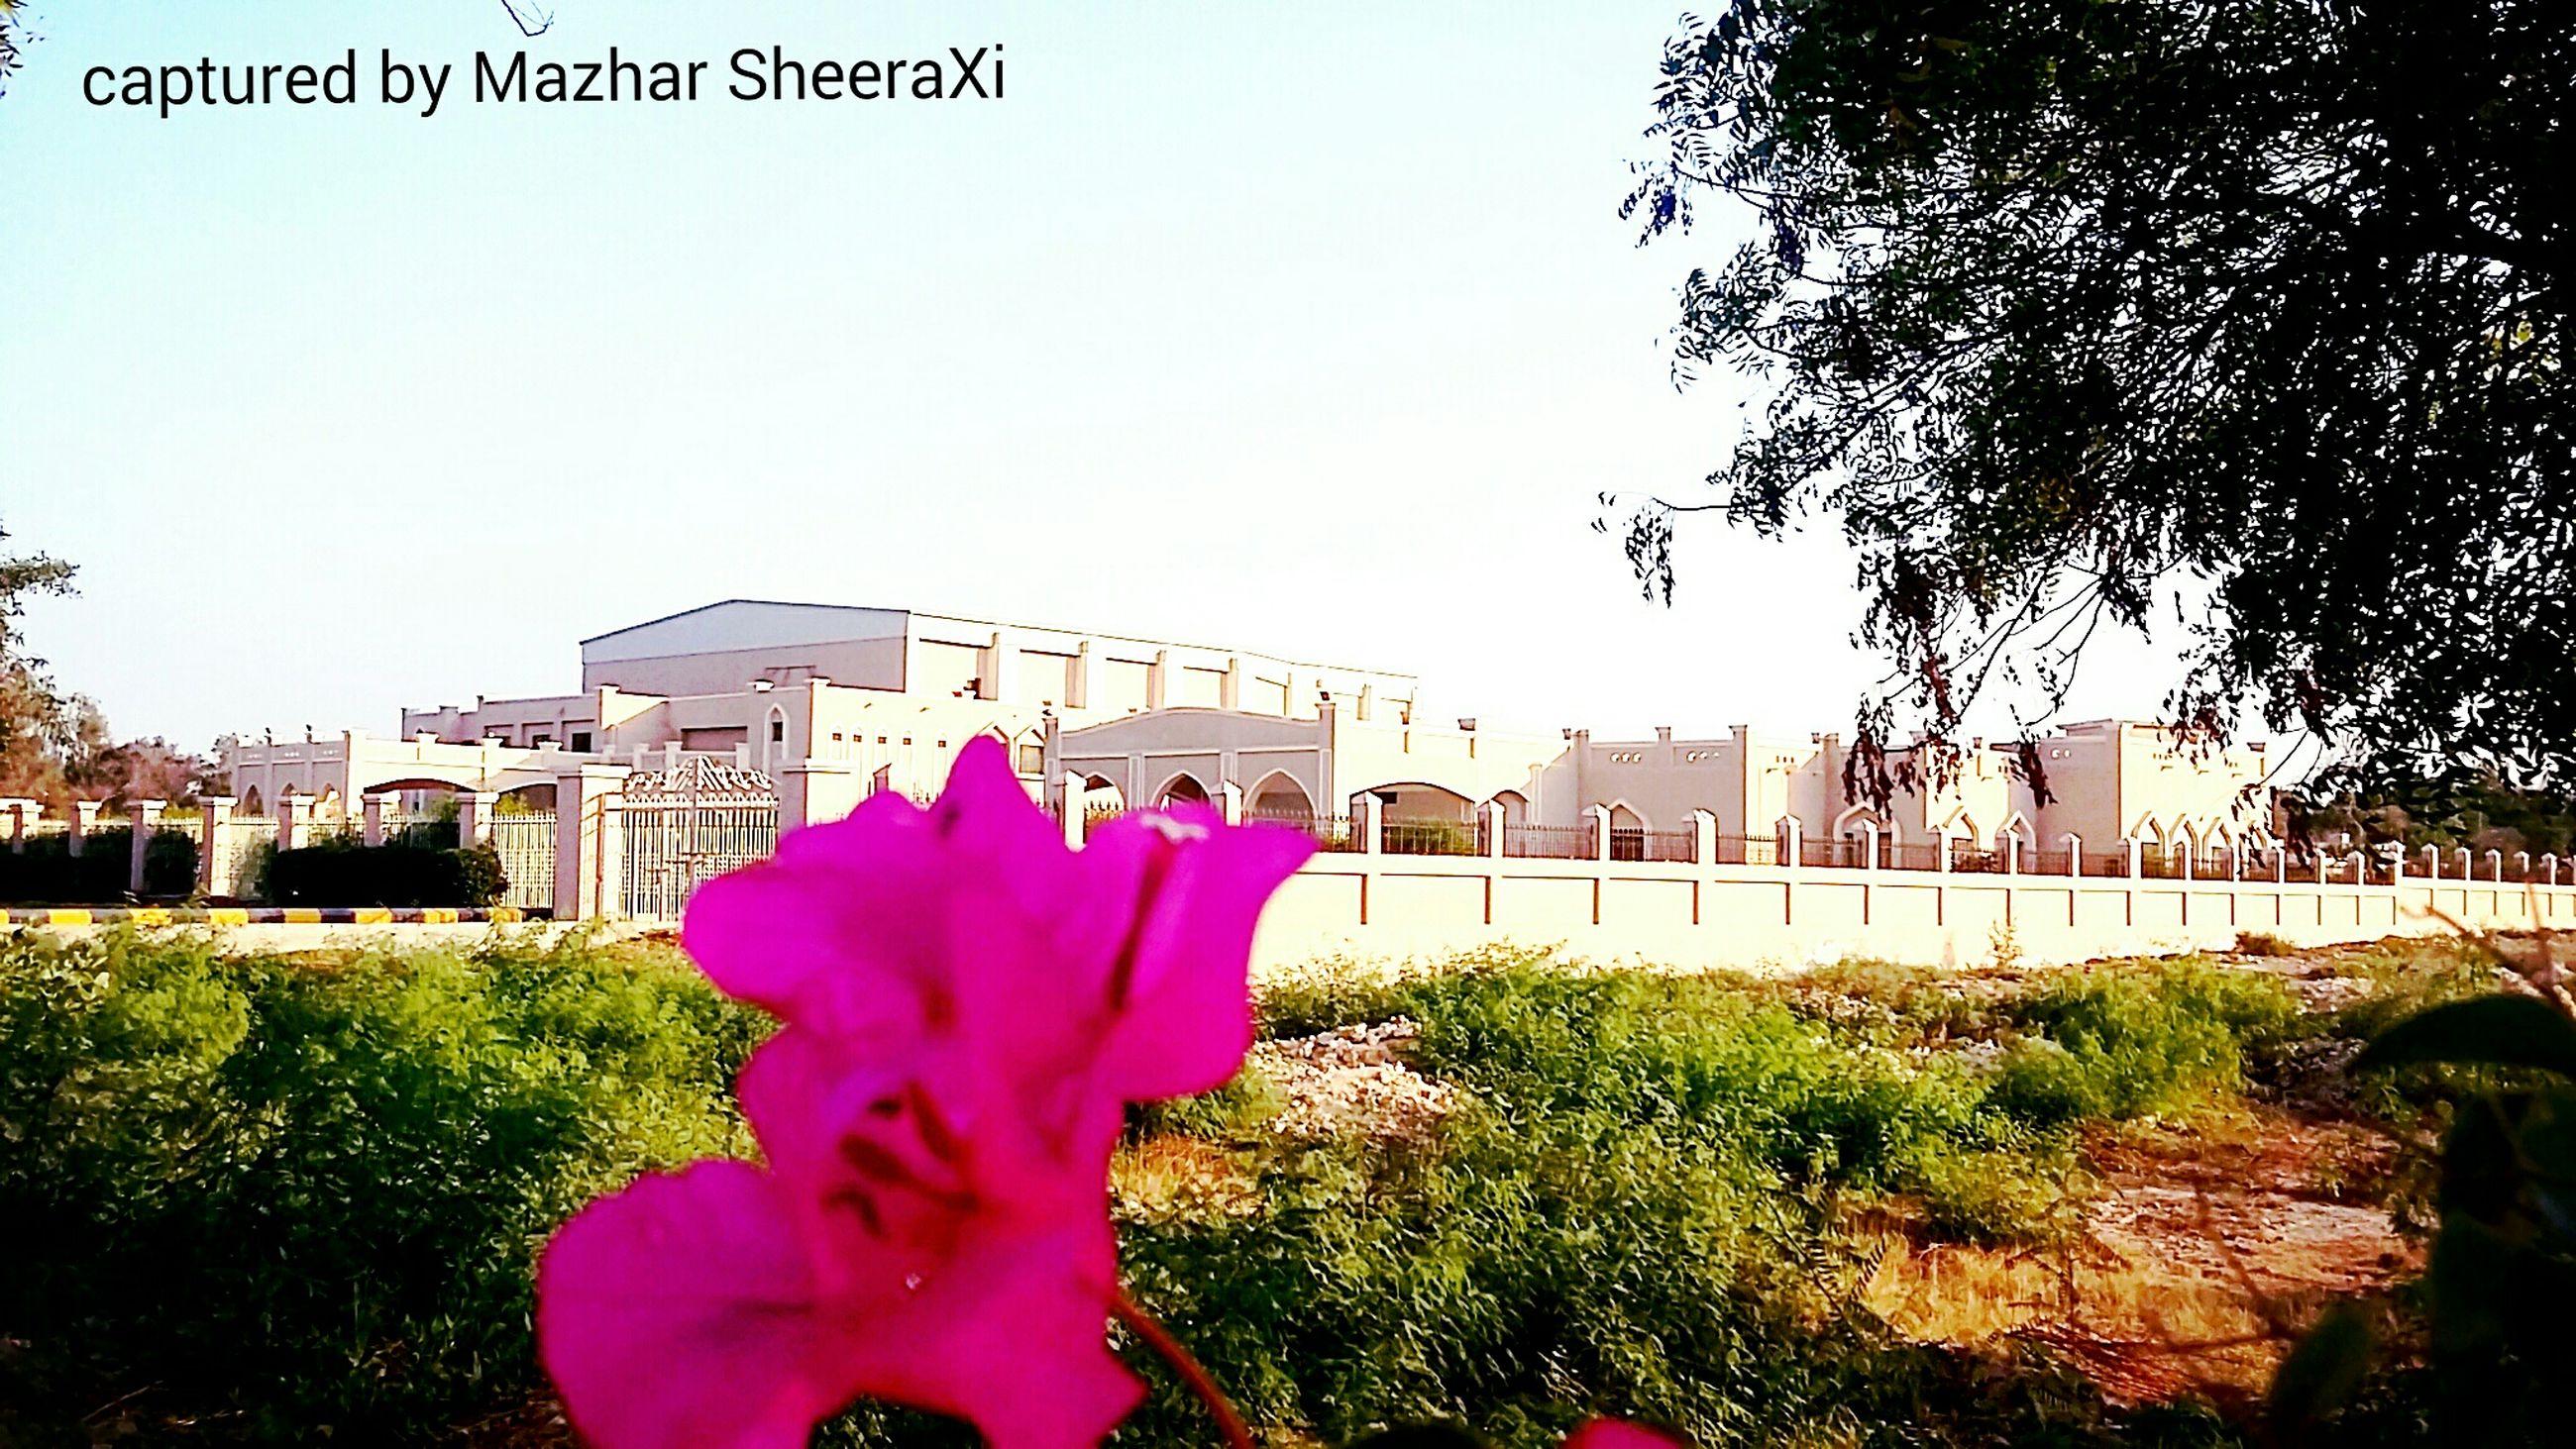 architecture, flower, built structure, building exterior, clear sky, pink color, growth, plant, city, famous place, tree, travel destinations, copy space, day, outdoors, fragility, freshness, petal, tourism, travel